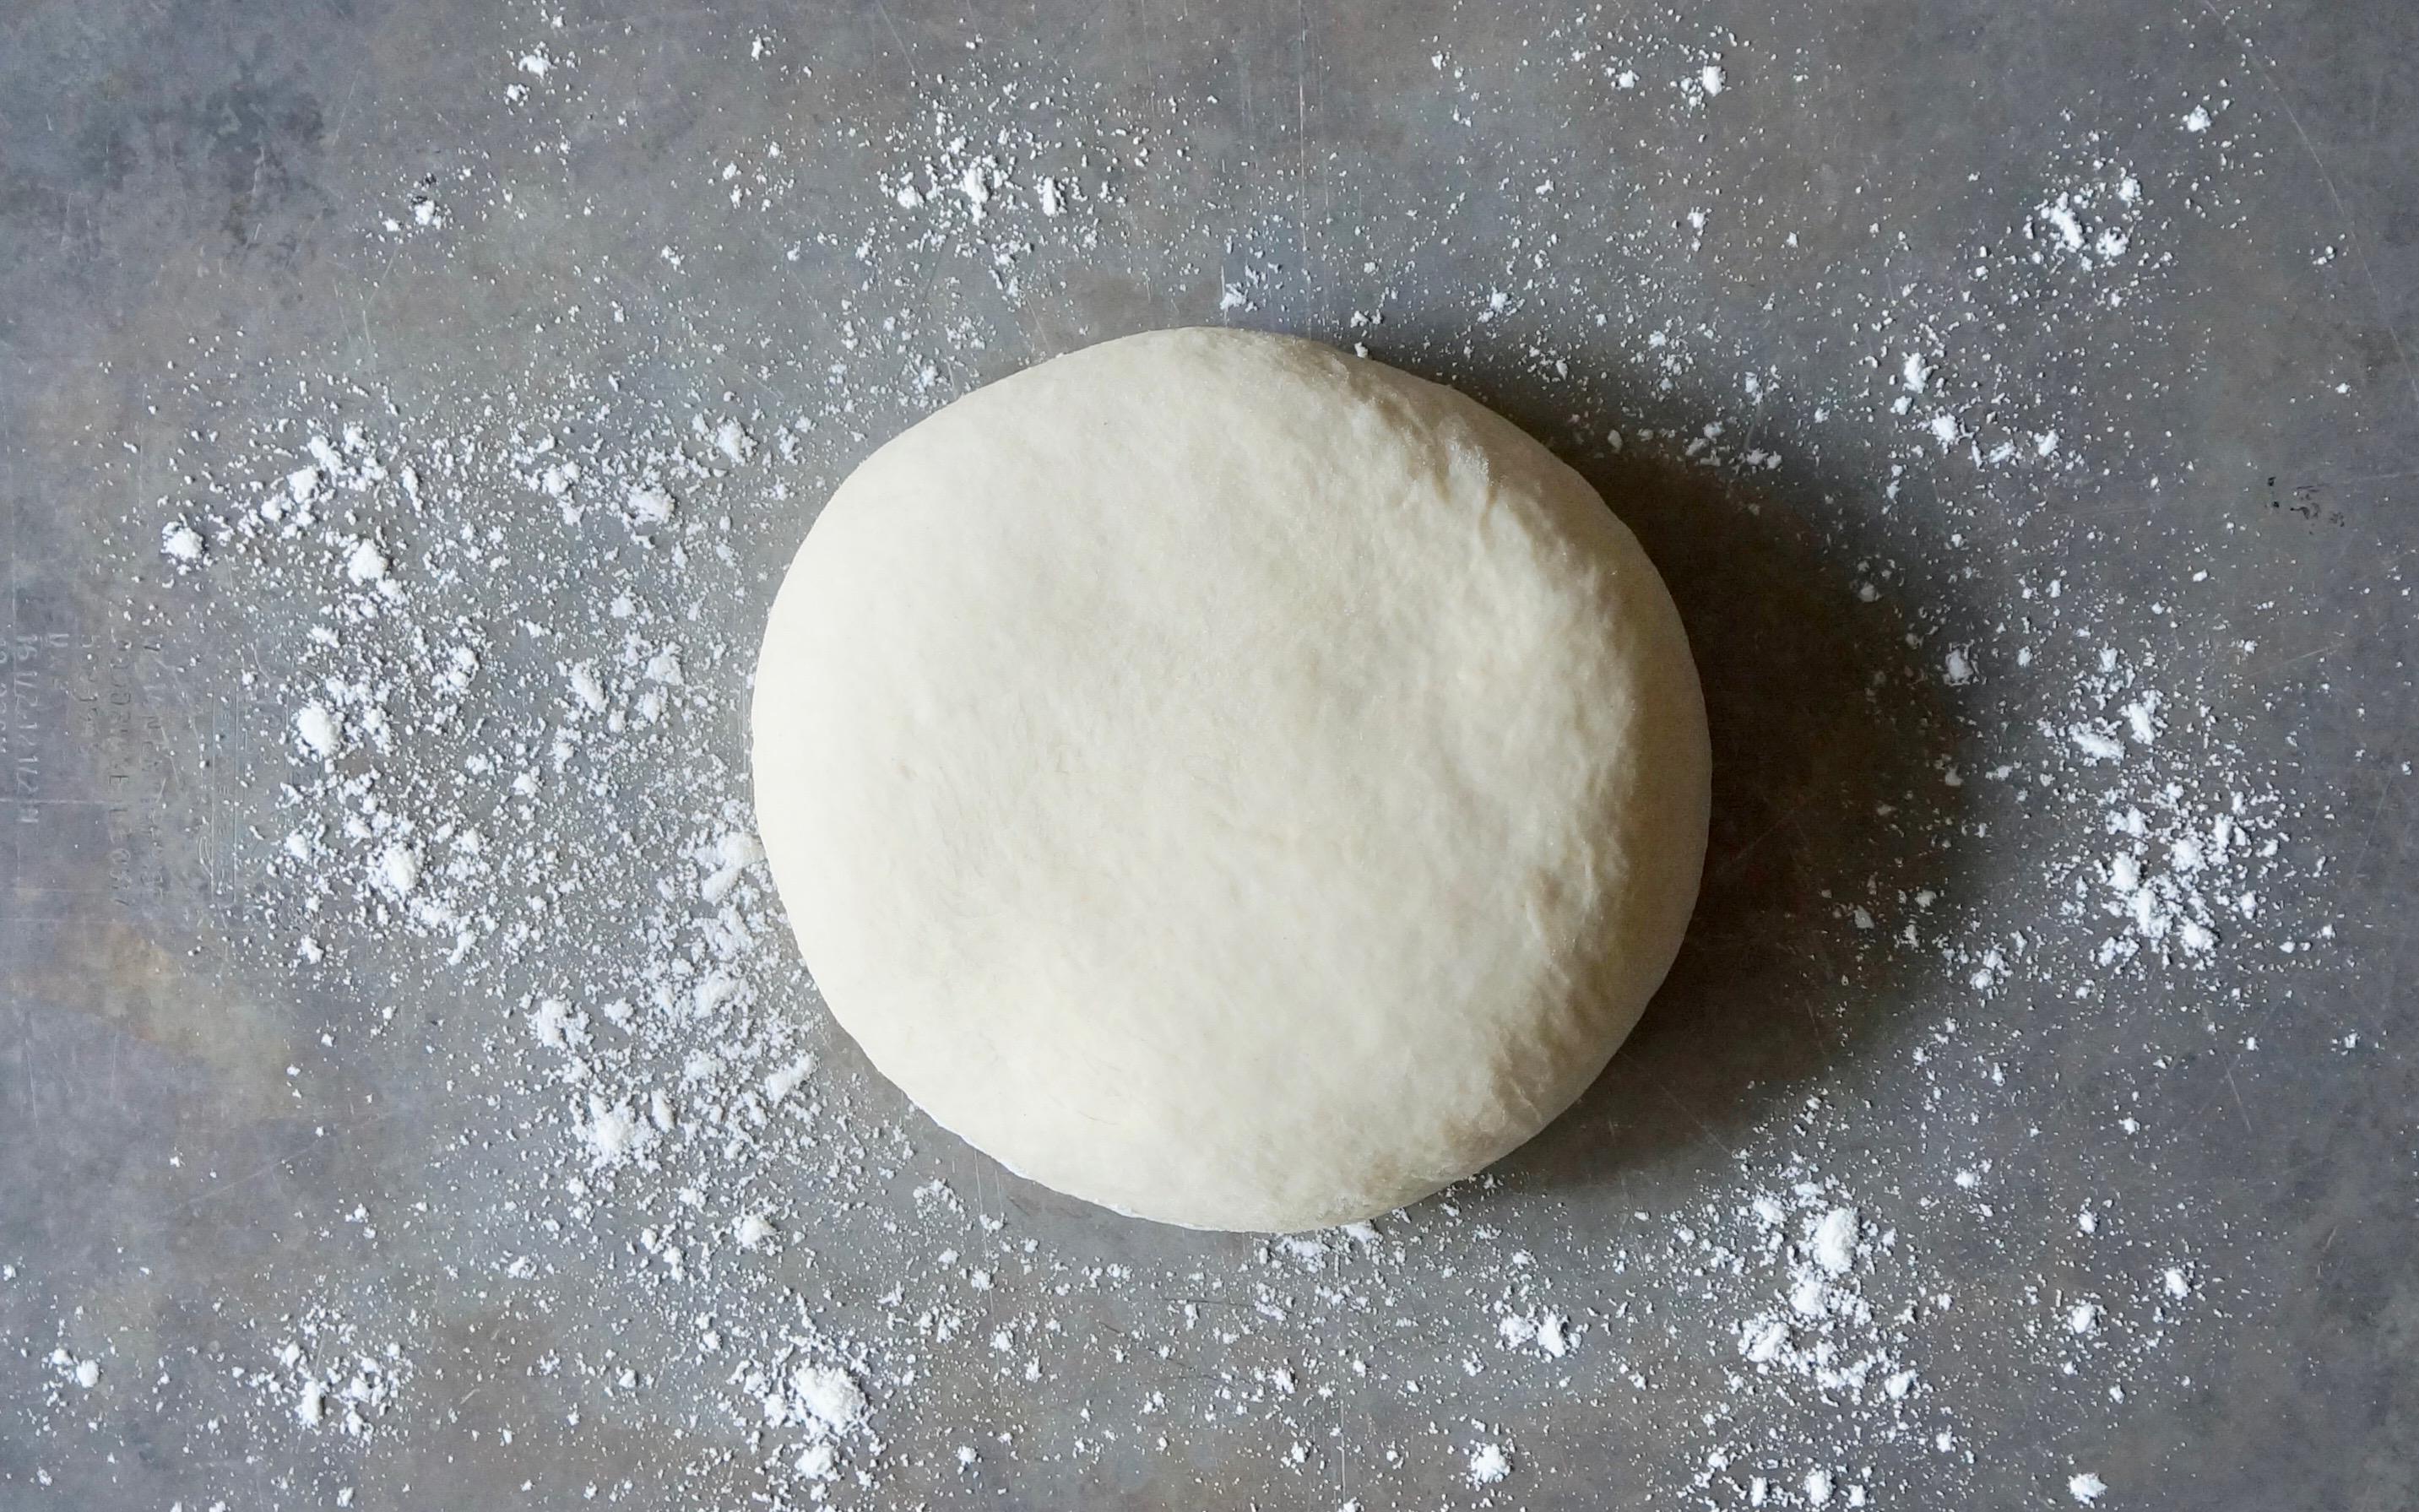 Buttermilk-Bunuelos-Rebecca-Gordon-Publisher-Buttermilk-Lipstick-Culinary-Entertaining-Techniques-Southern-Hostess-RebeccaGordon-Pastry-Chef-Birmingham-Alabama